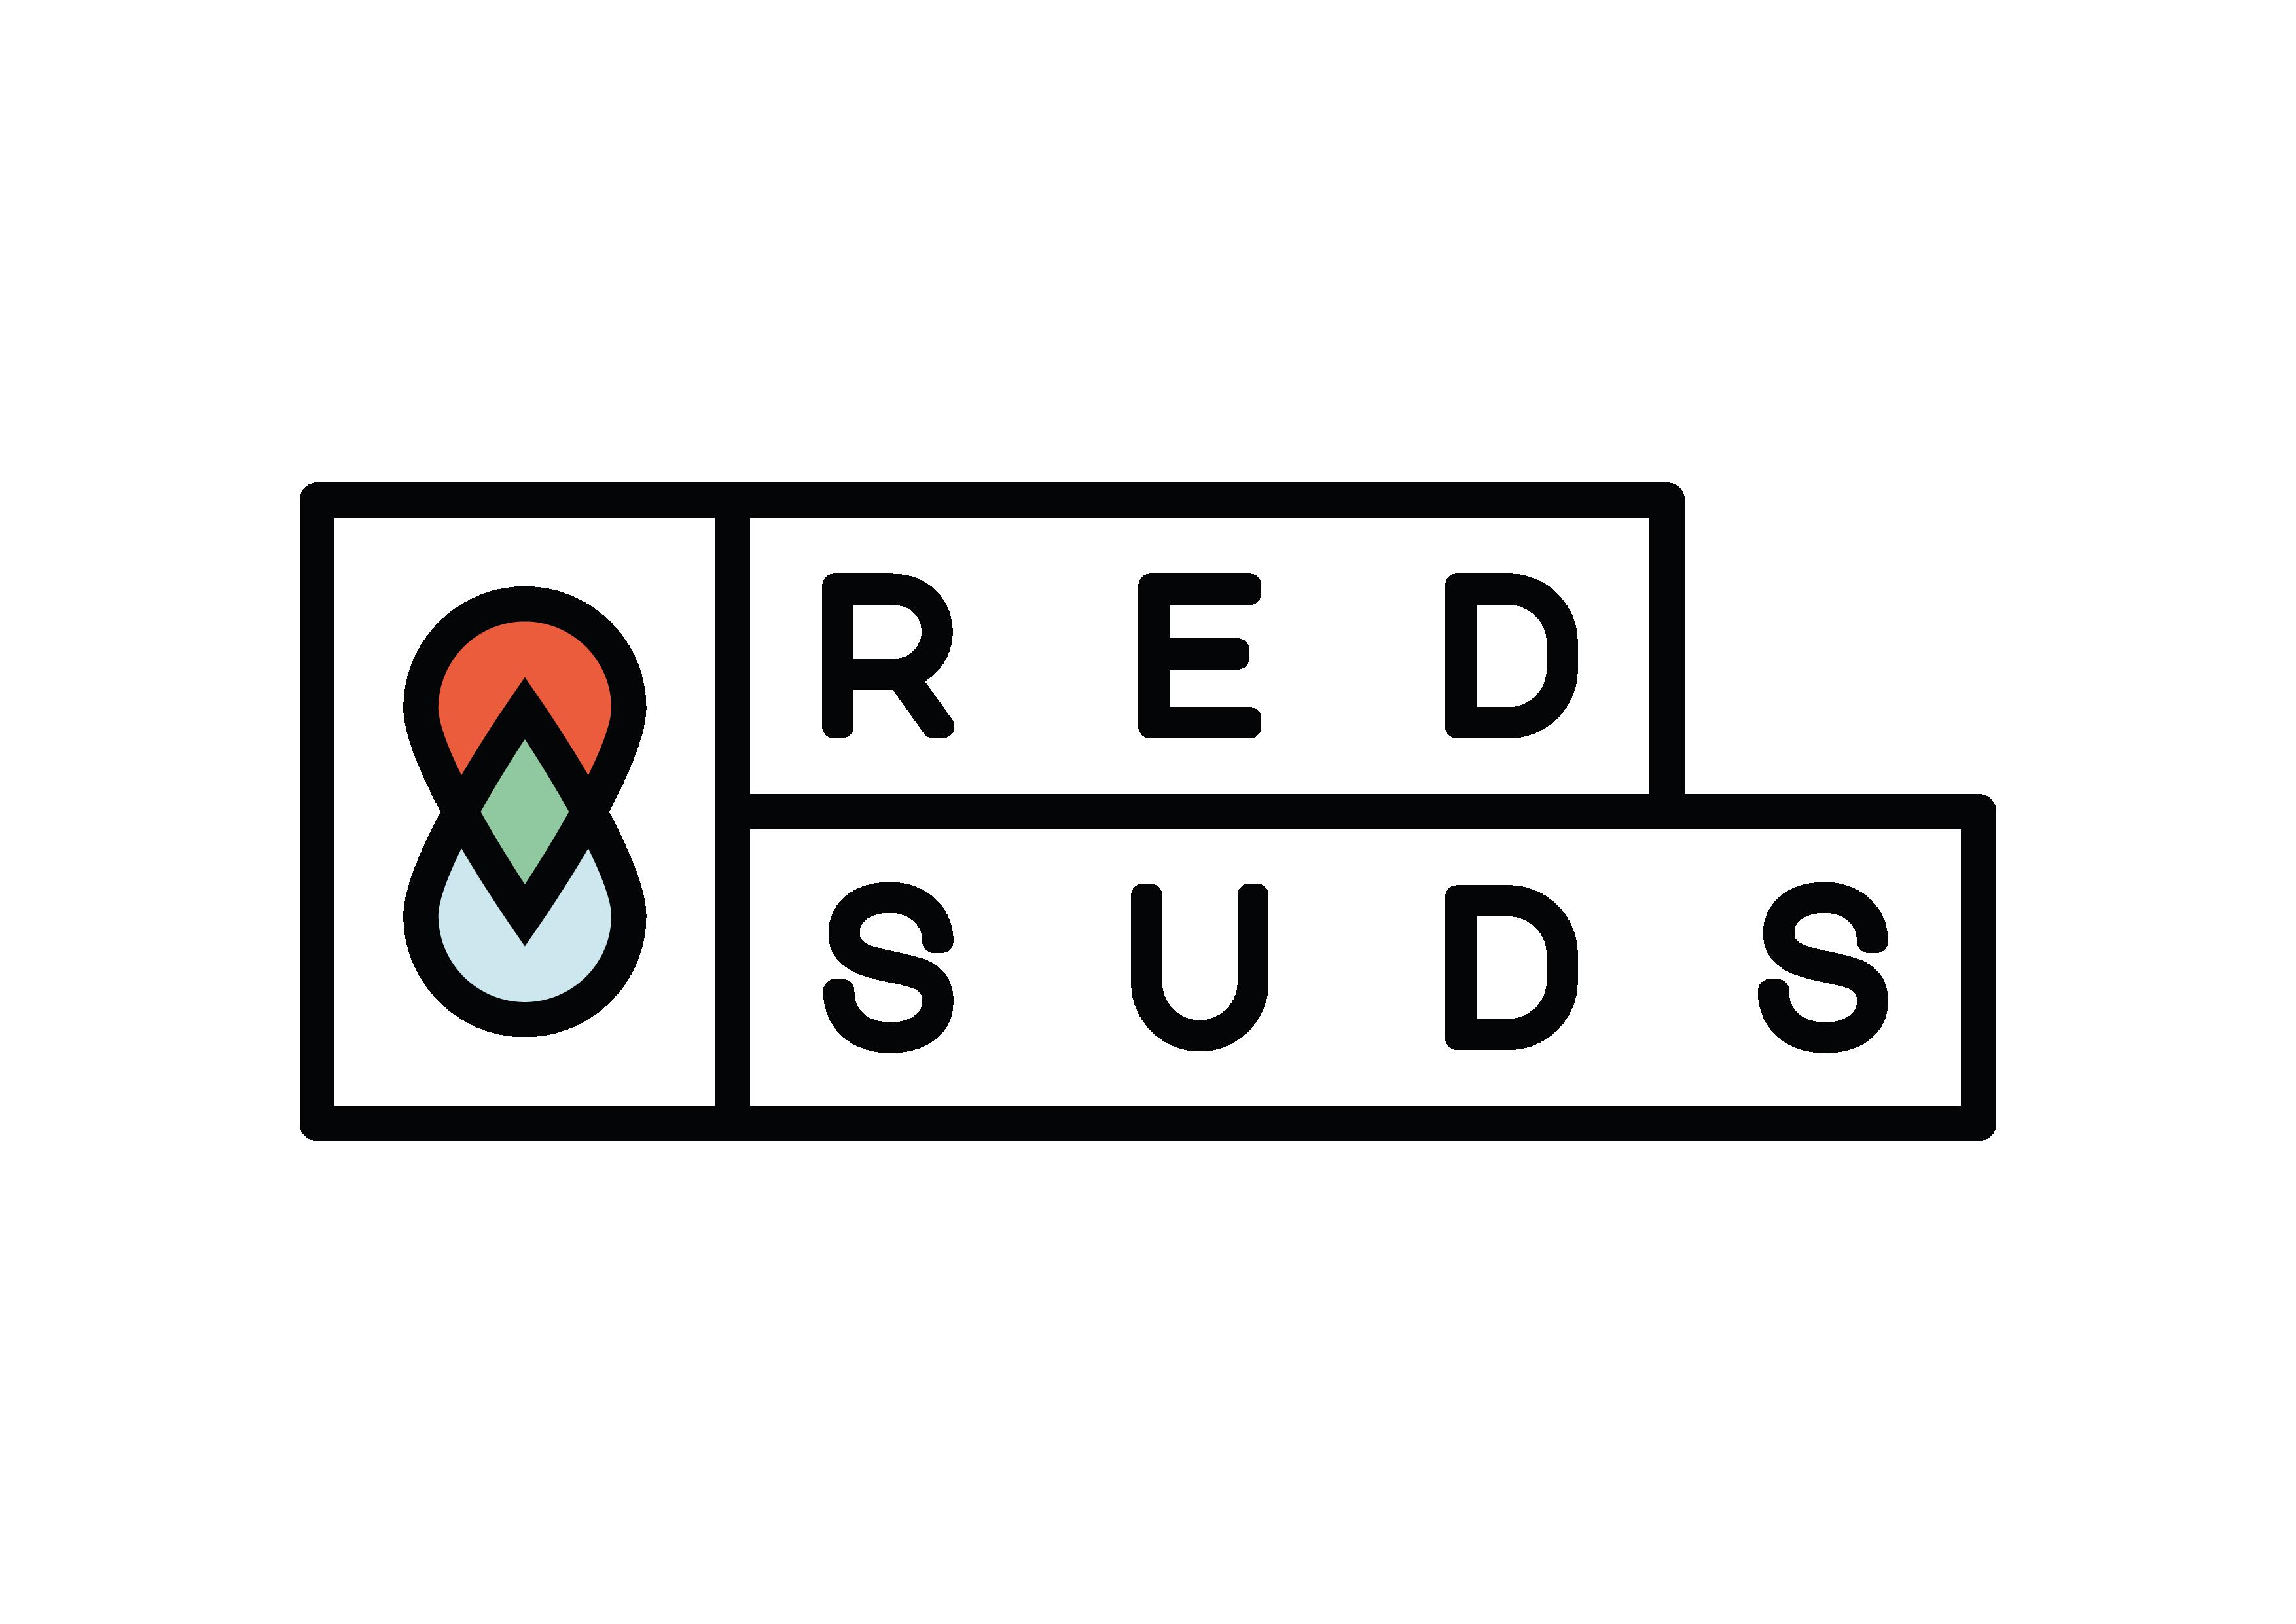 redSUDS